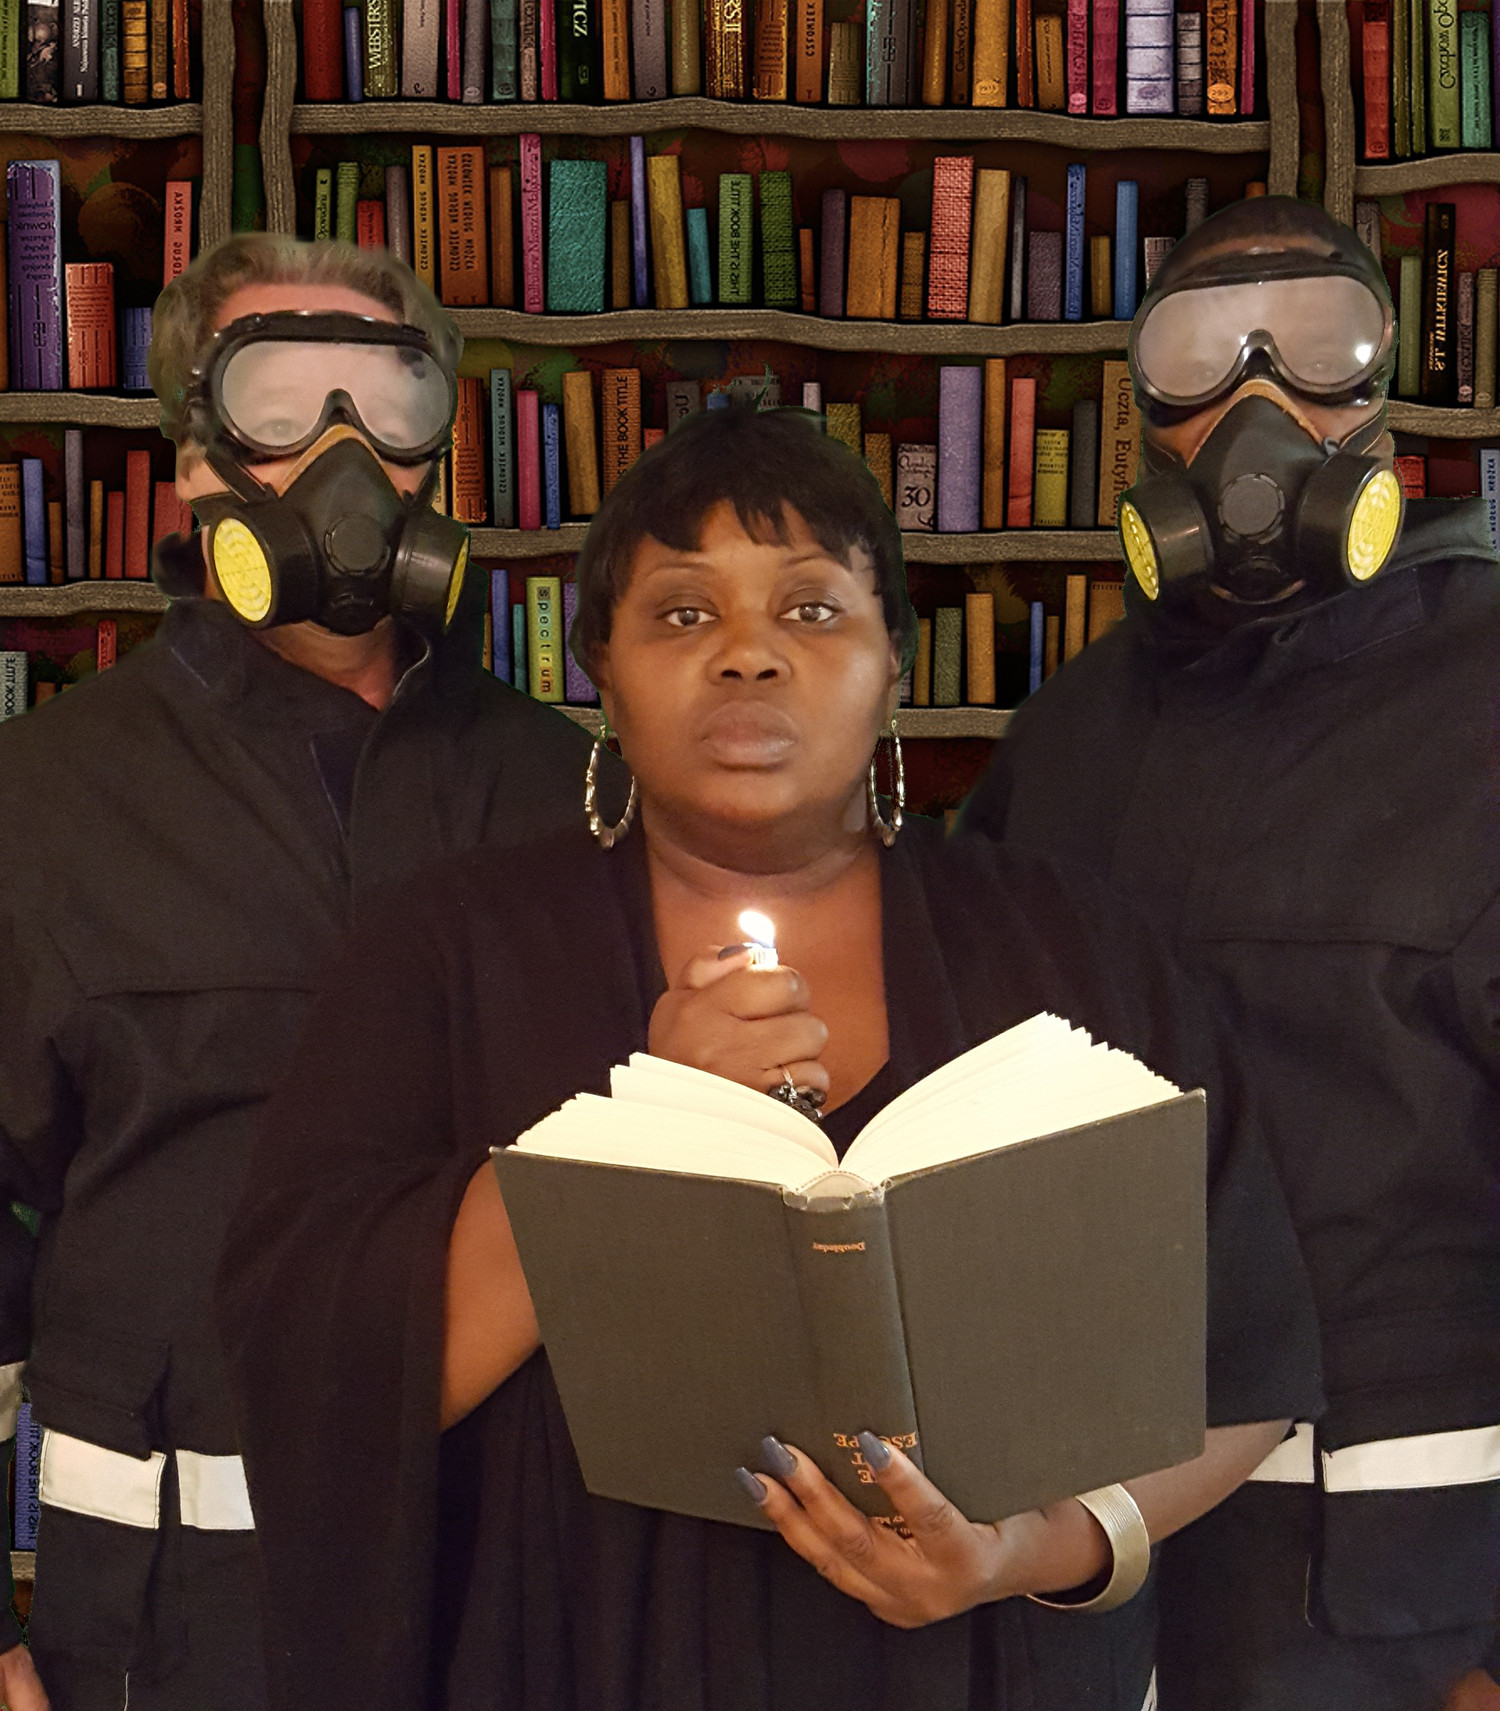 BWW Review: Subversive Energy Still Ignites FAHRENHEIT 451